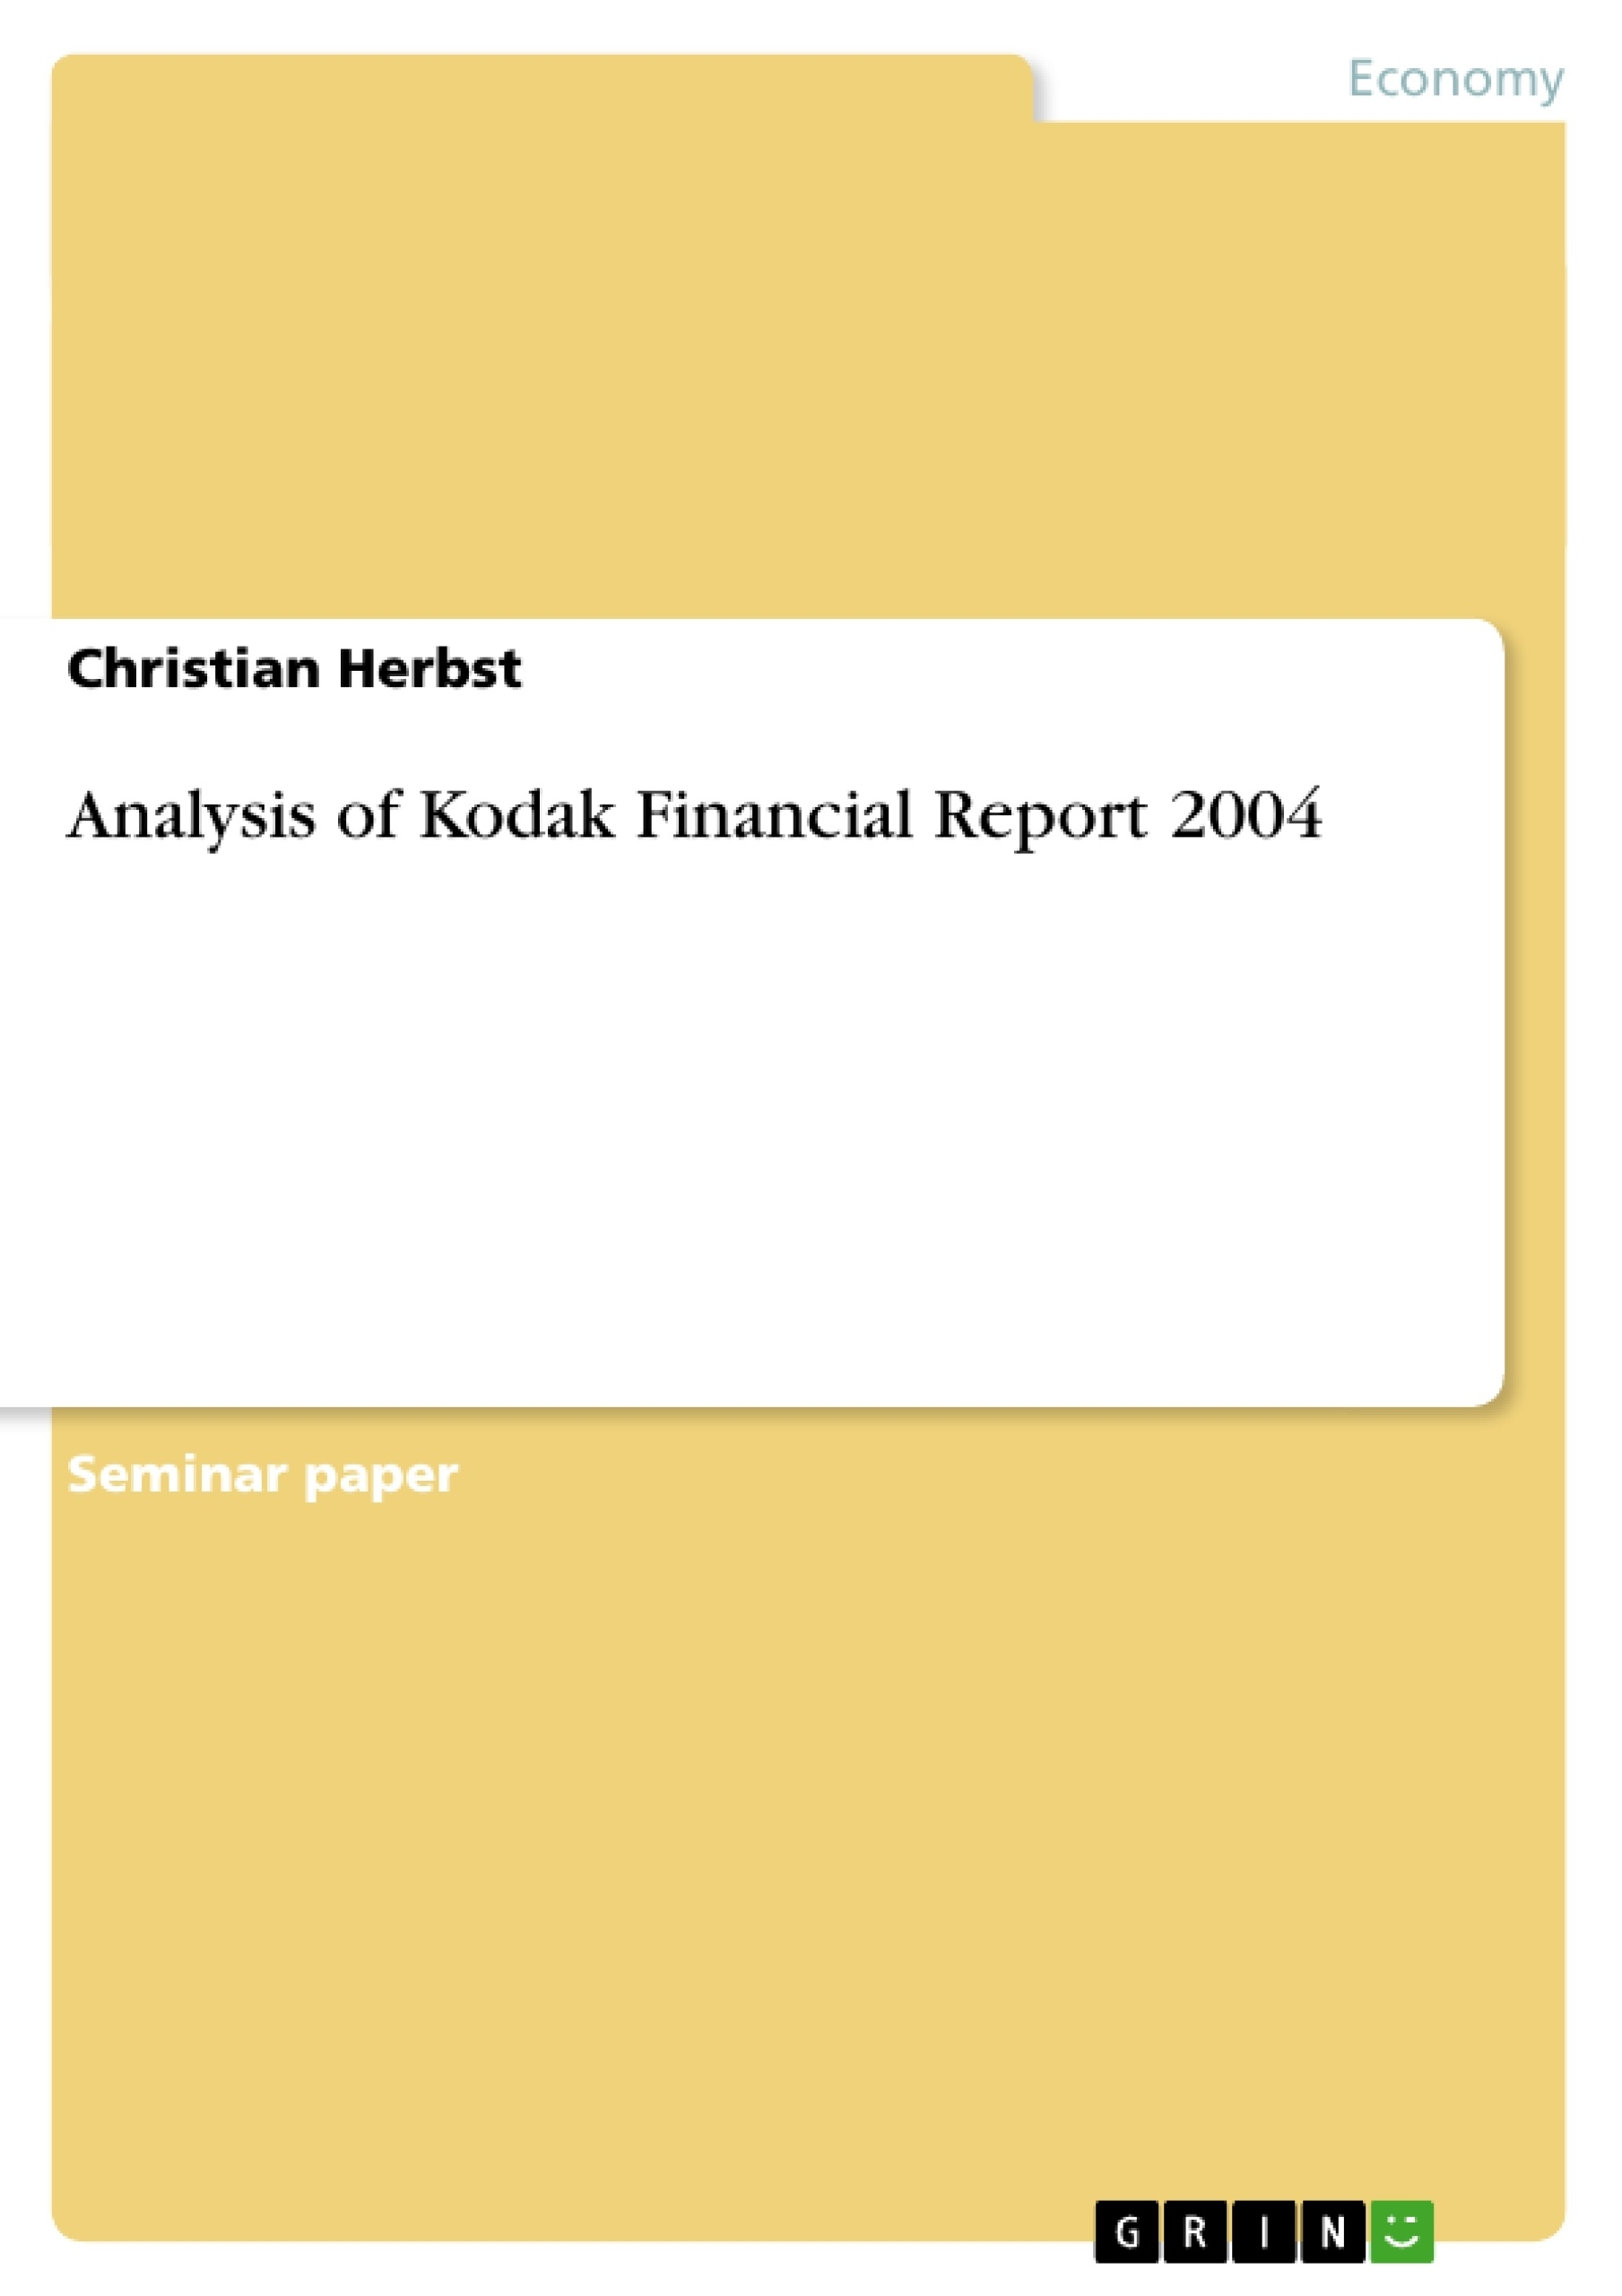 Title: Analysis of Kodak Financial Report 2004